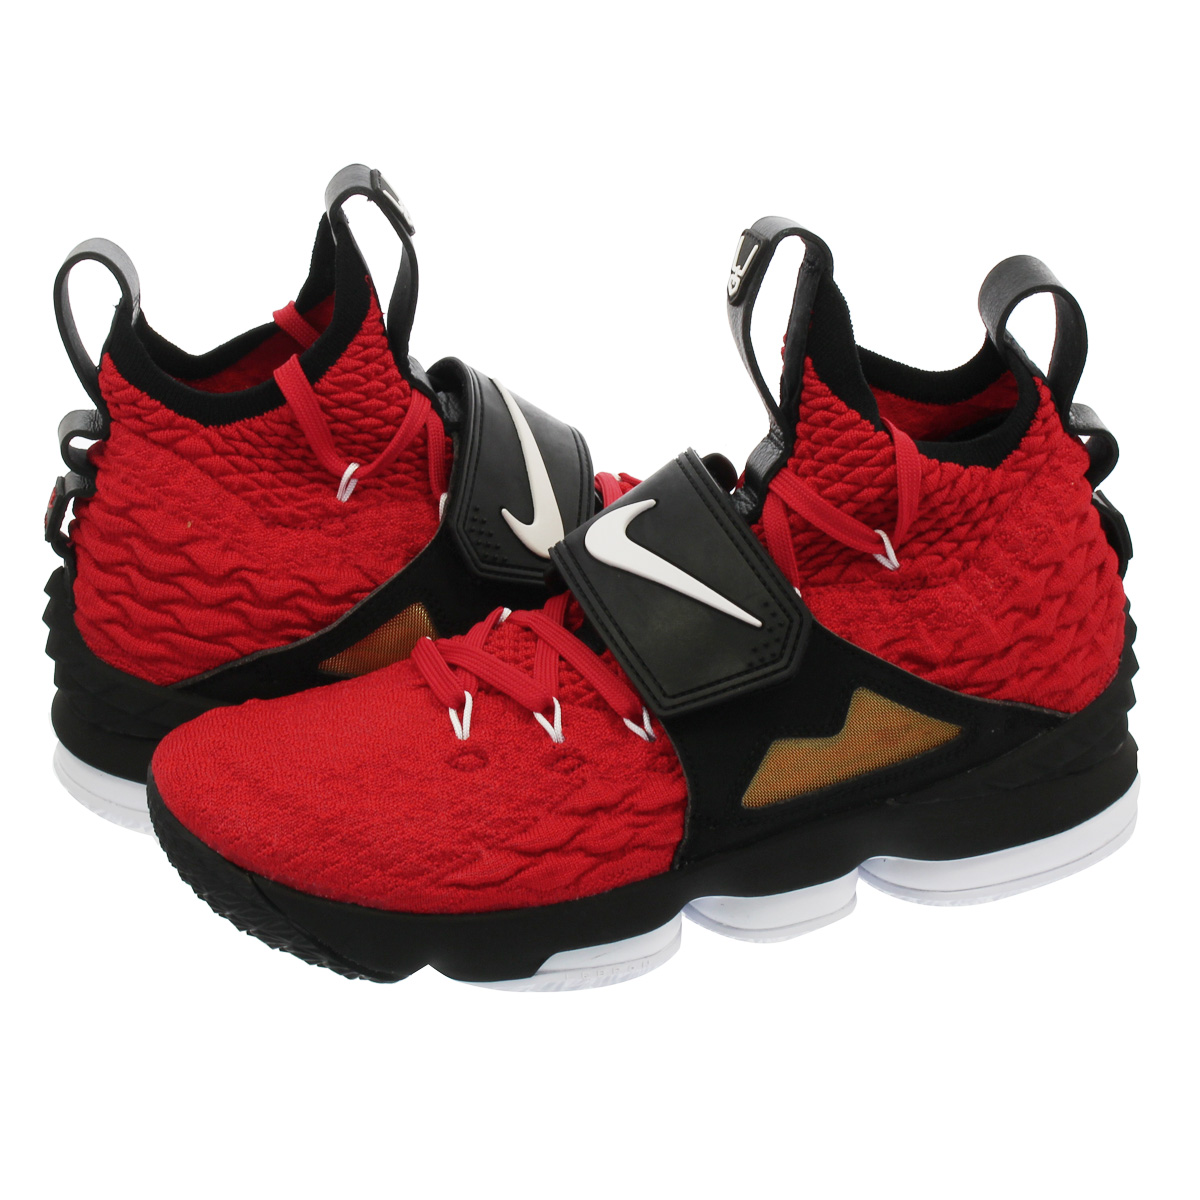 half off 9245d 3ed44 NIKE LEBRON 15 Nike Revlon 15 UNIVERSITY RED/WHITE/BLACK ao9144-600